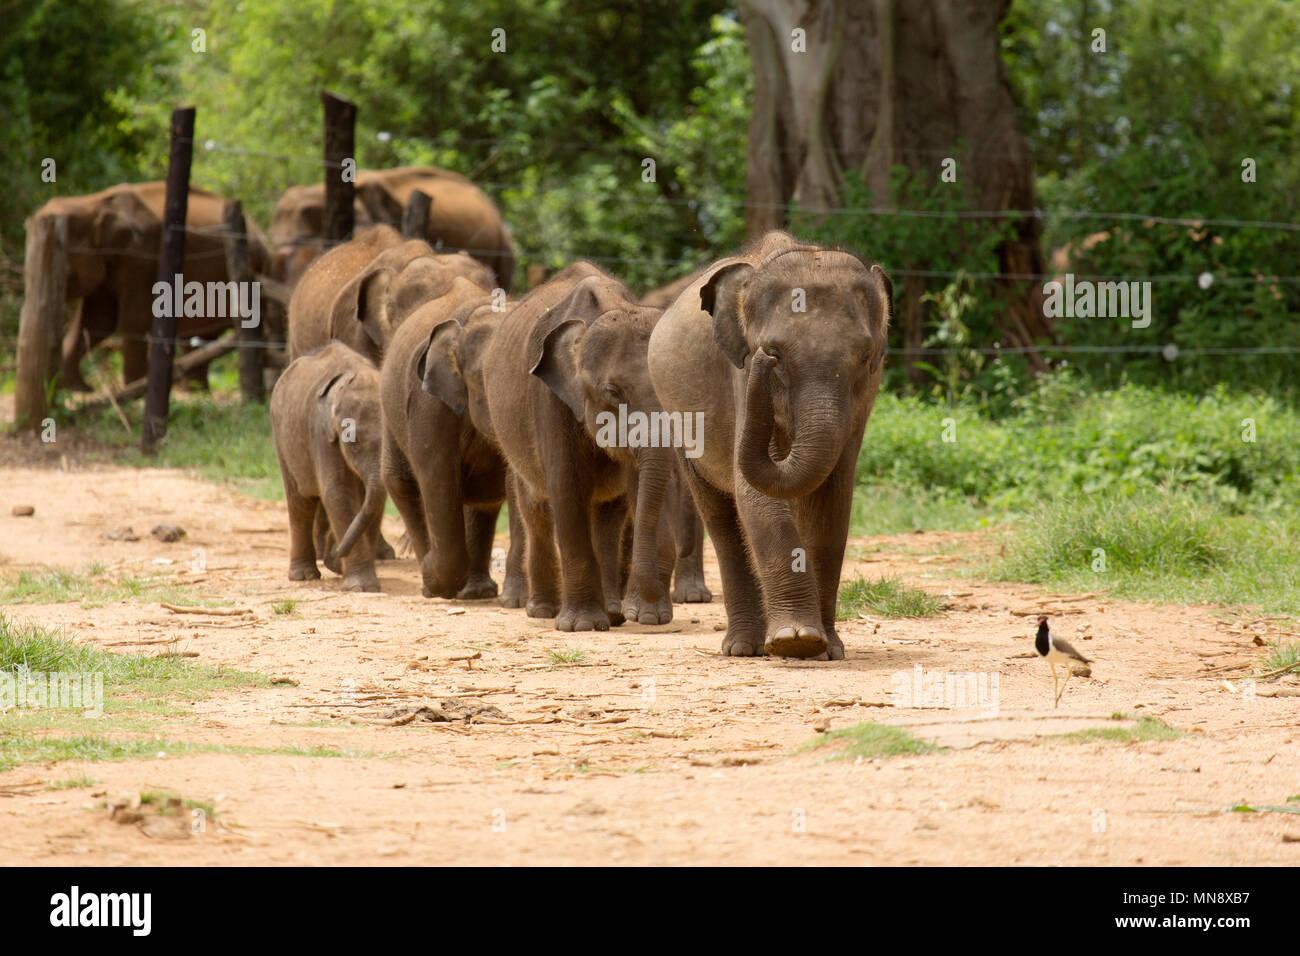 Gli elefanti avanzamento all'Elefante Udwawalawe Casa di transito a Uwawalawe parco nazionale in Sri Lanka. Immagini Stock